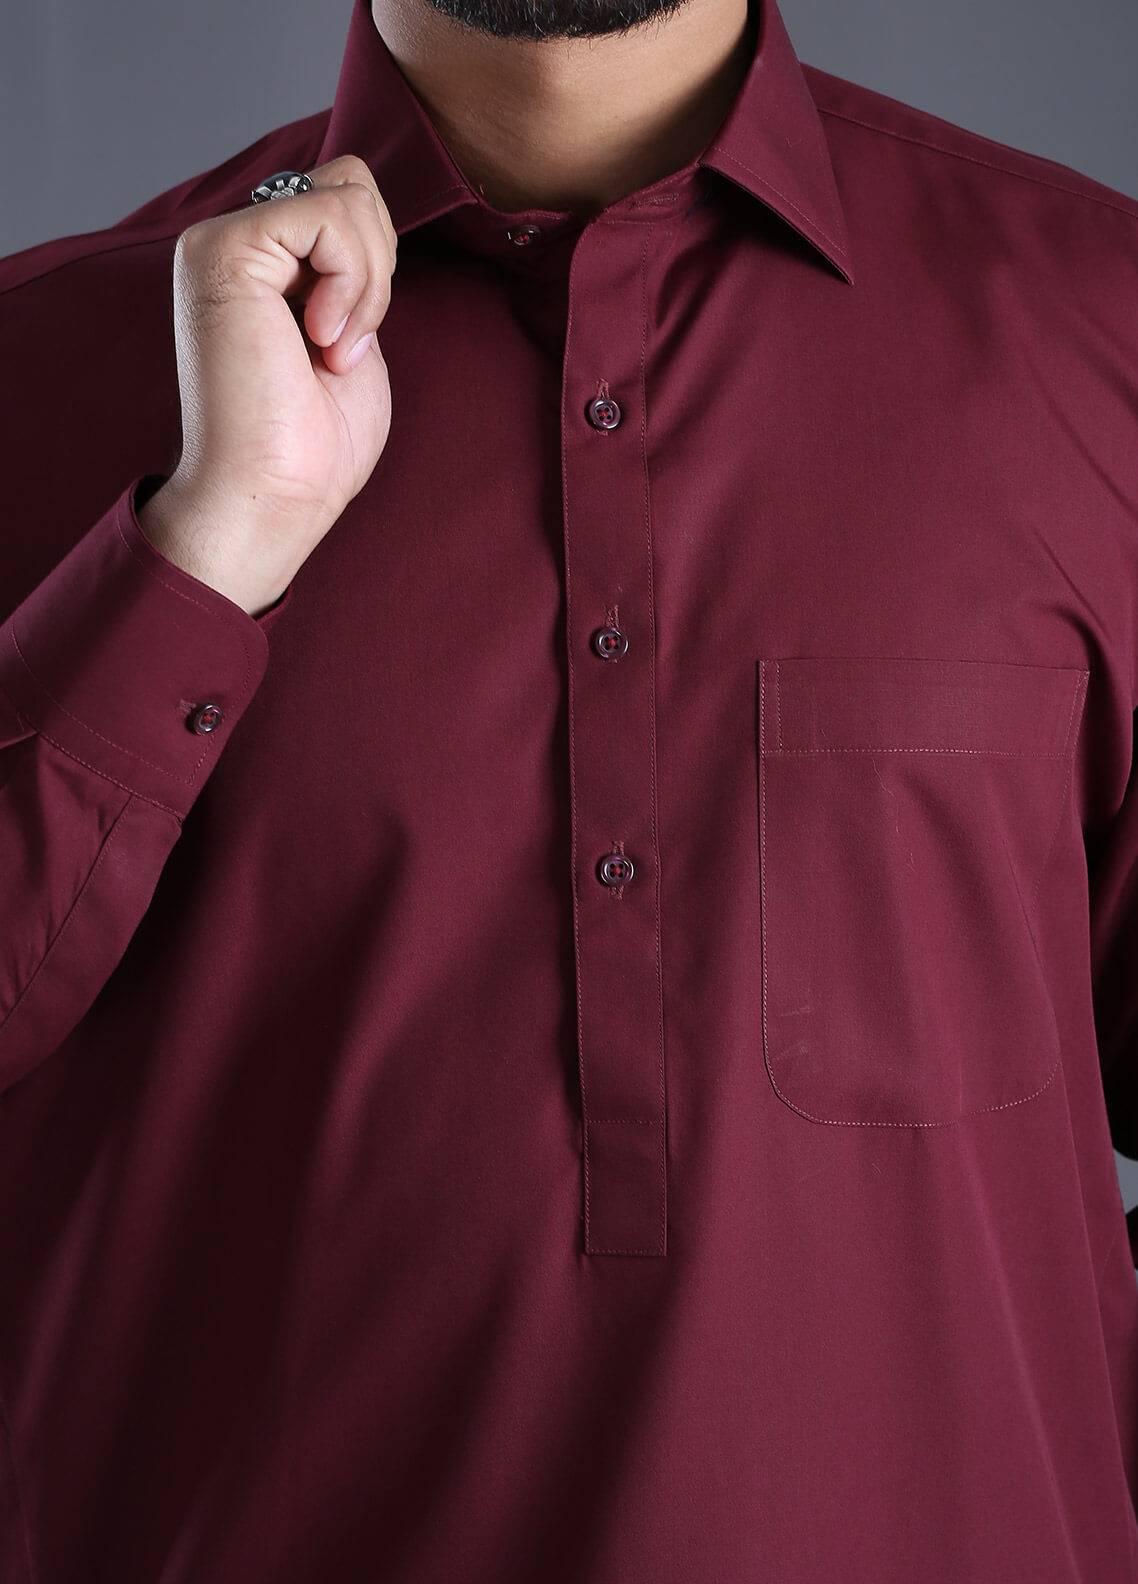 Skangen Wash N Wear Formal Men Kameez Shalwar - Maroon Alst-0002